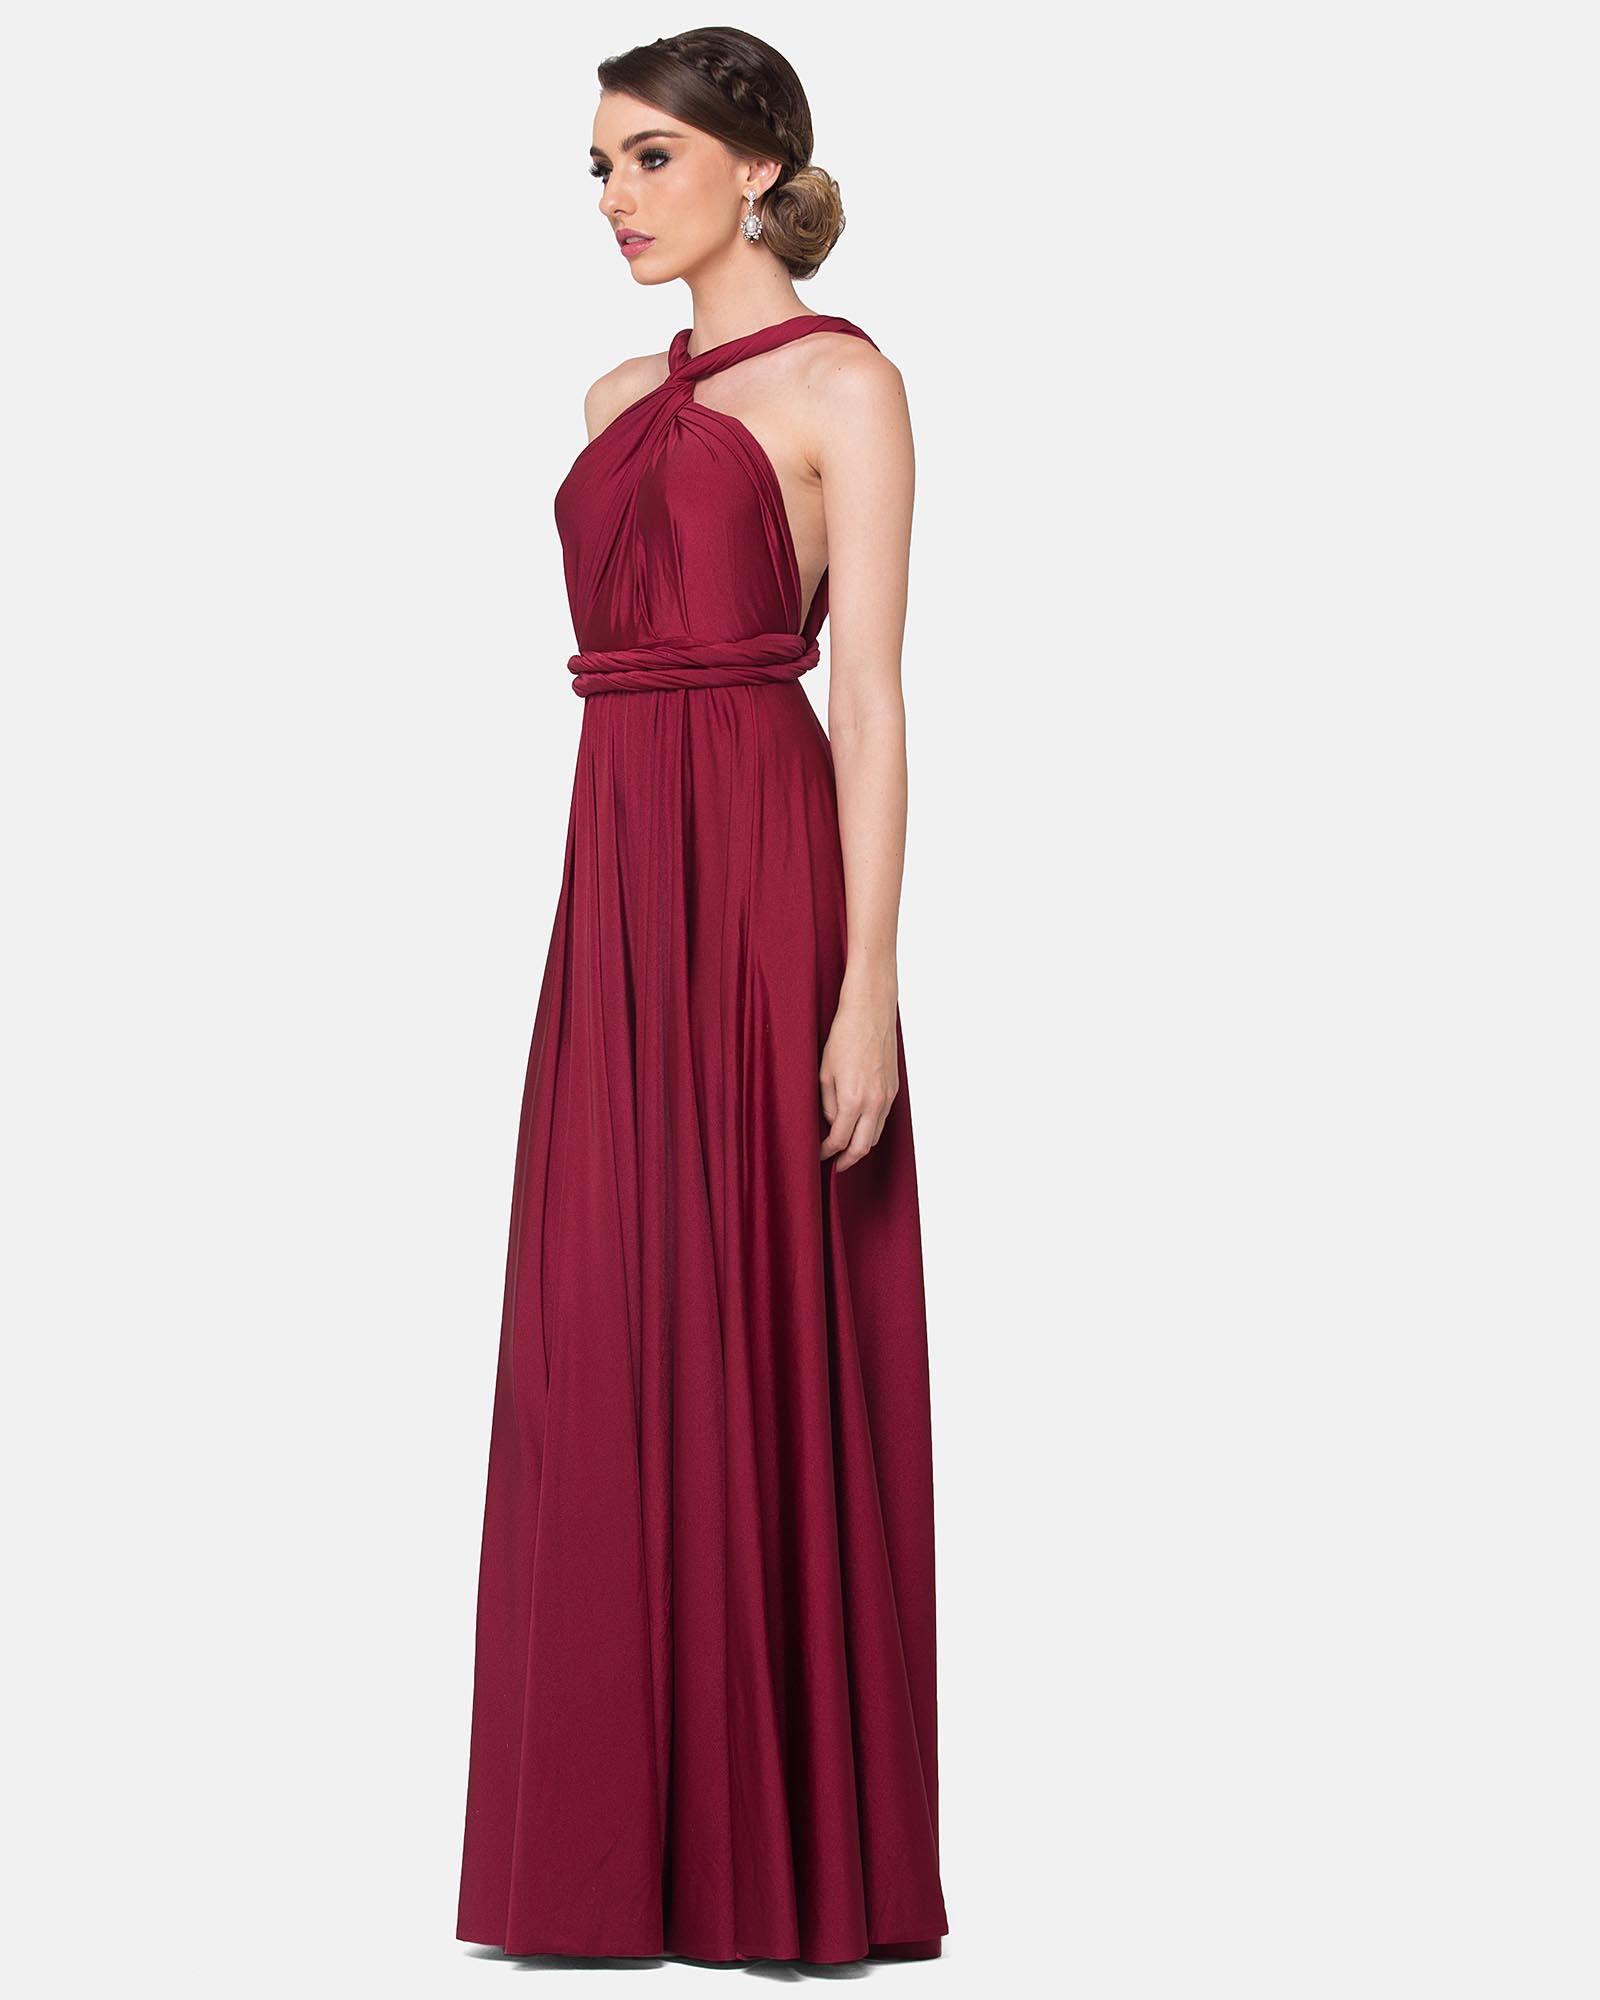 Merlot Infinity Wrap Bridesmaids Dress By Tania Olsen